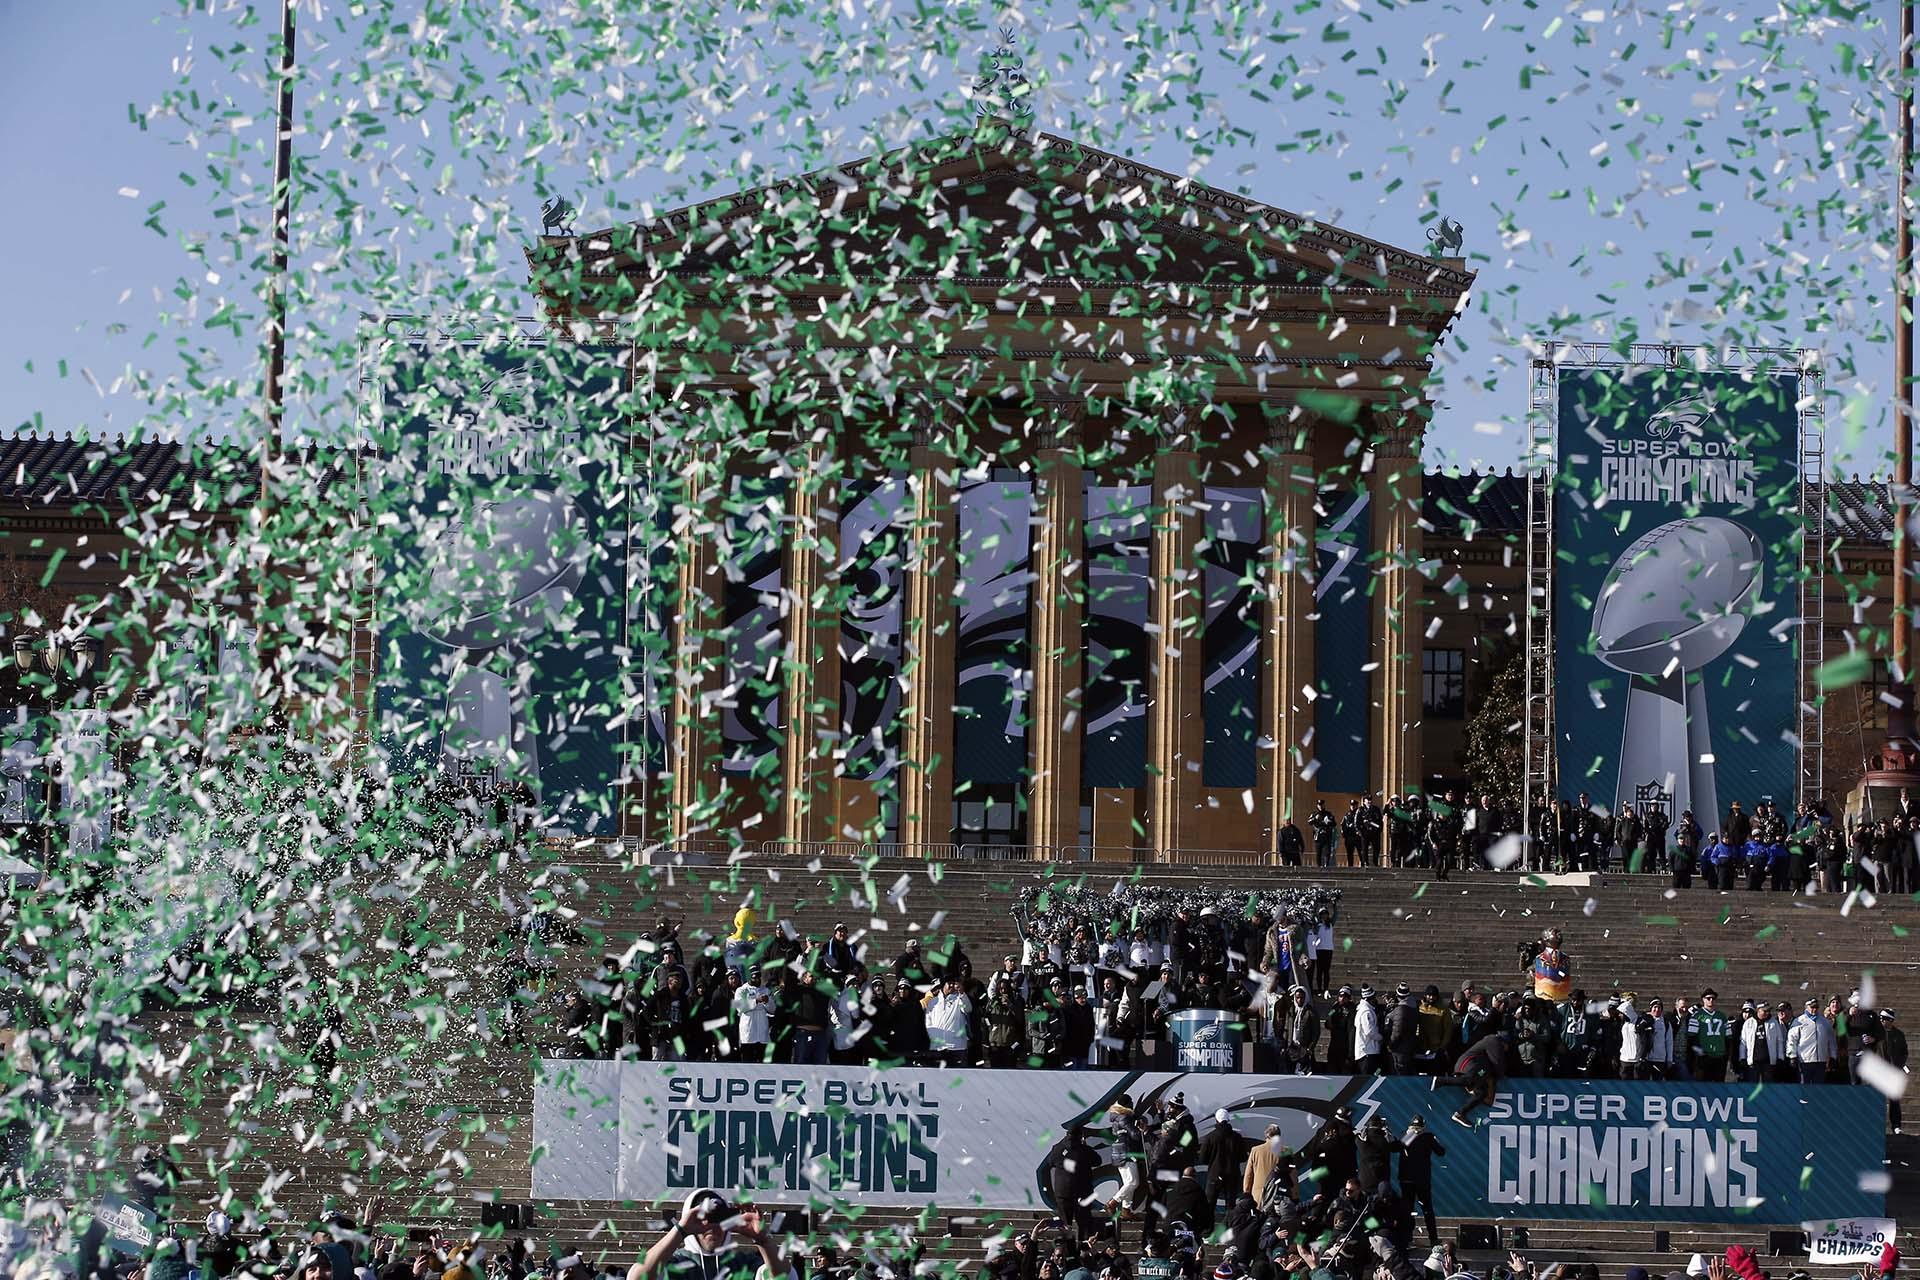 Una lluvia de papelitos sobre los campeones del Super Bowl LII